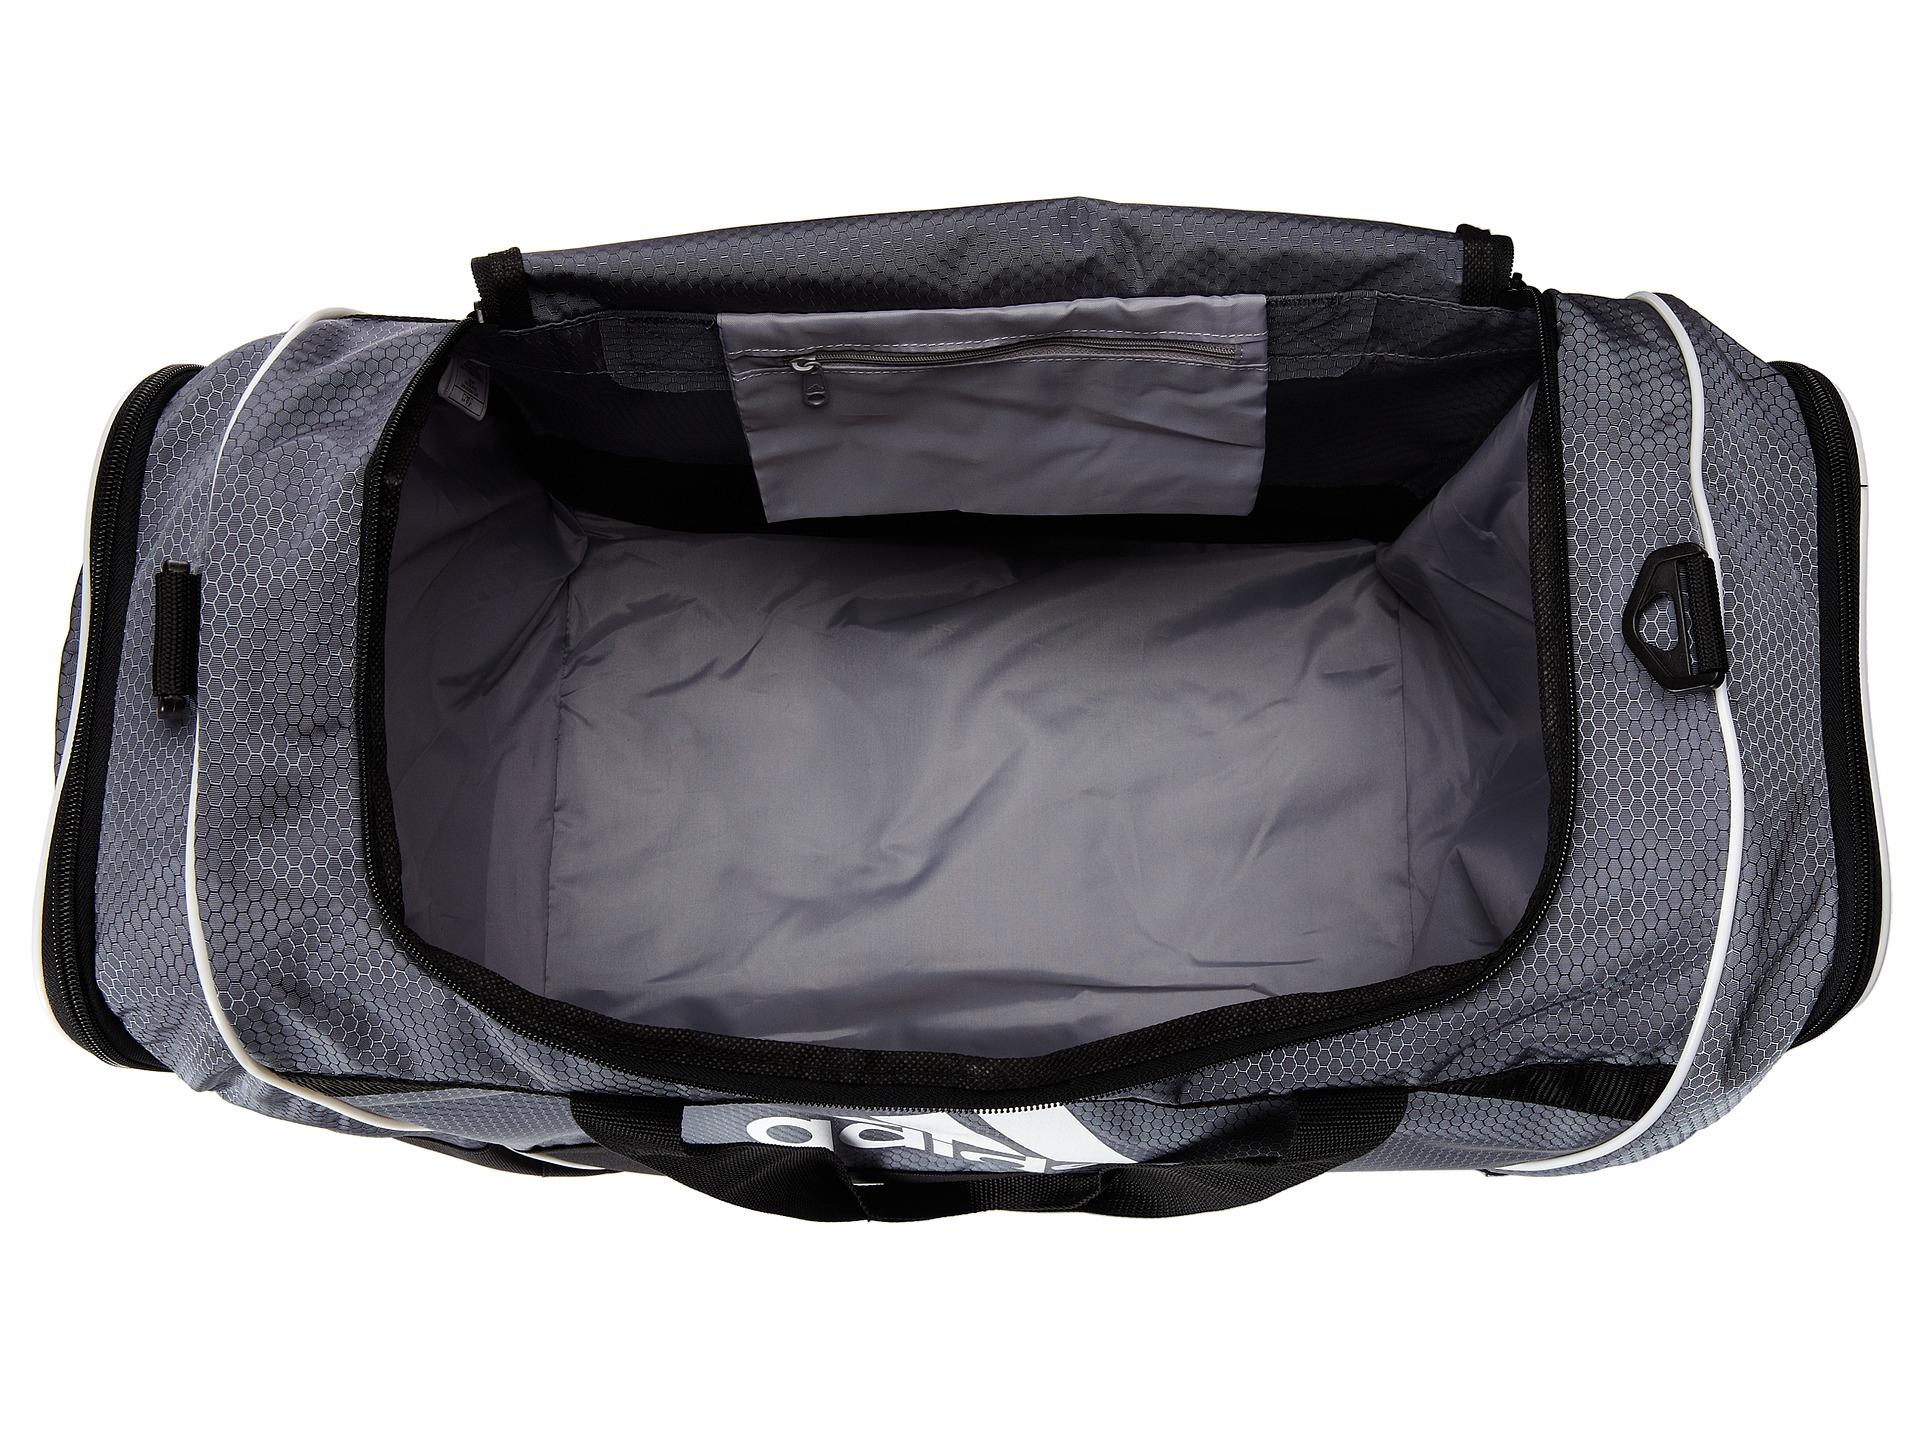 fe5975532d76 Lyst - adidas Originals Defender Ii Duffel Medium in Gray